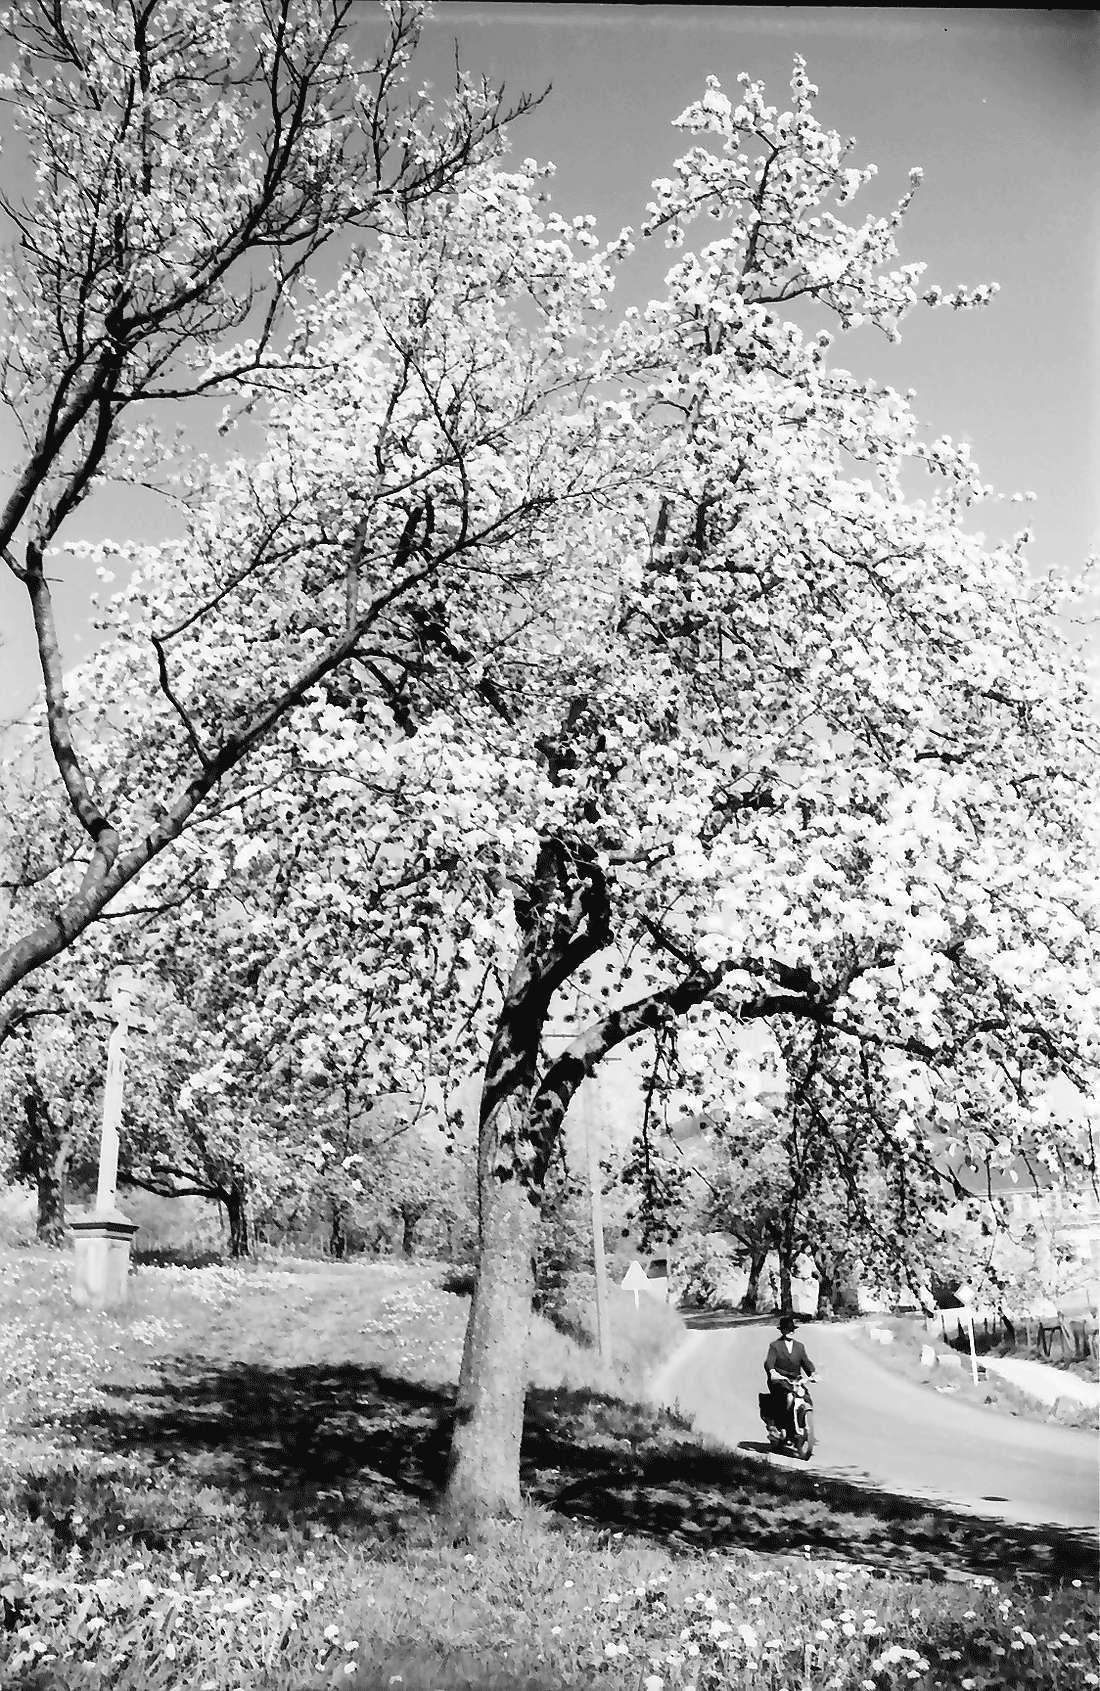 Bollschweil: Blütenbäume an der Straße, Bild 1